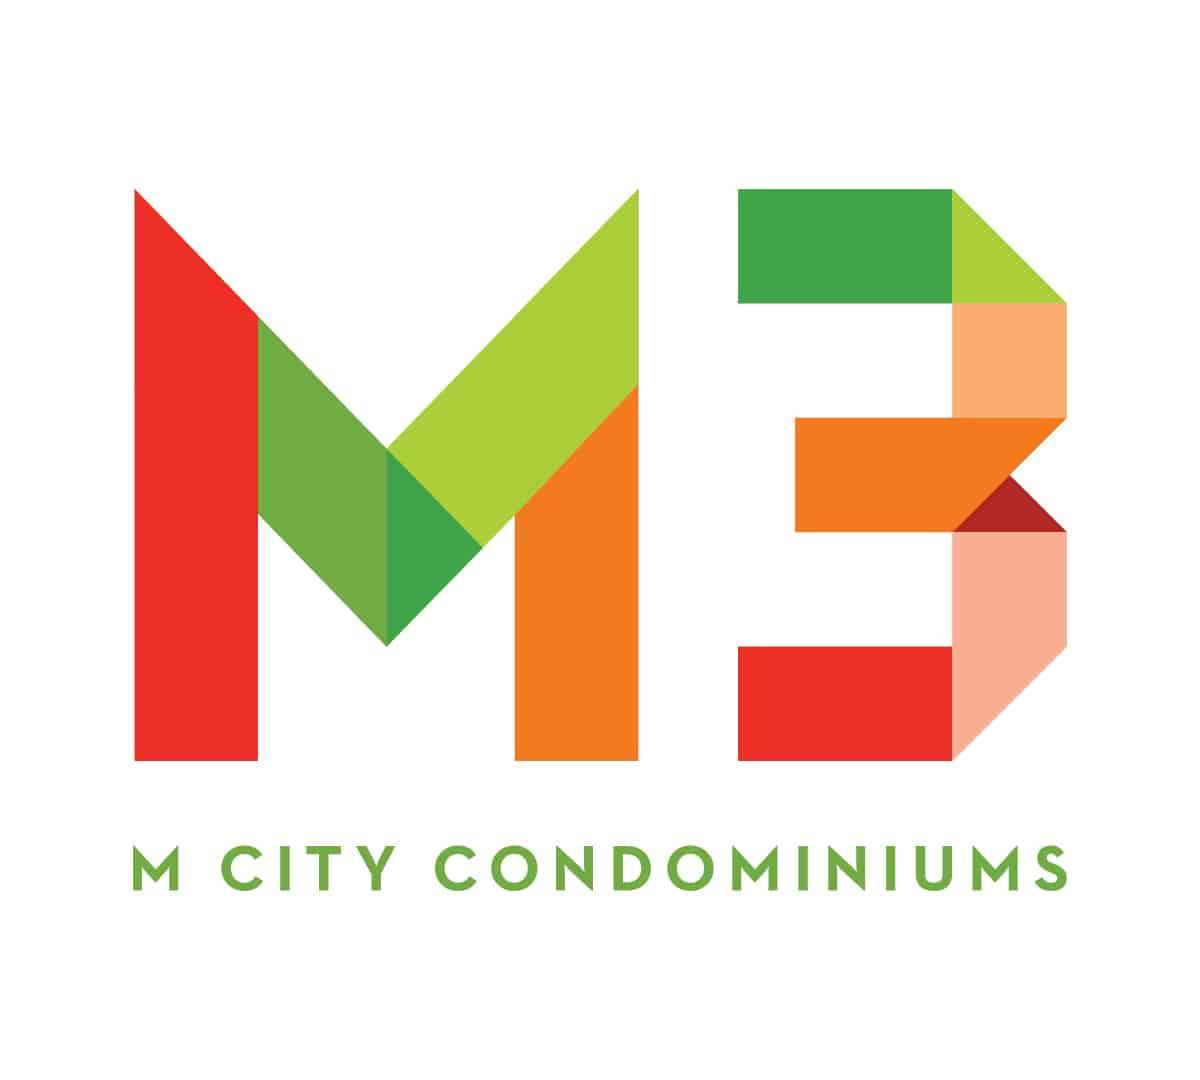 M City 3 & 4